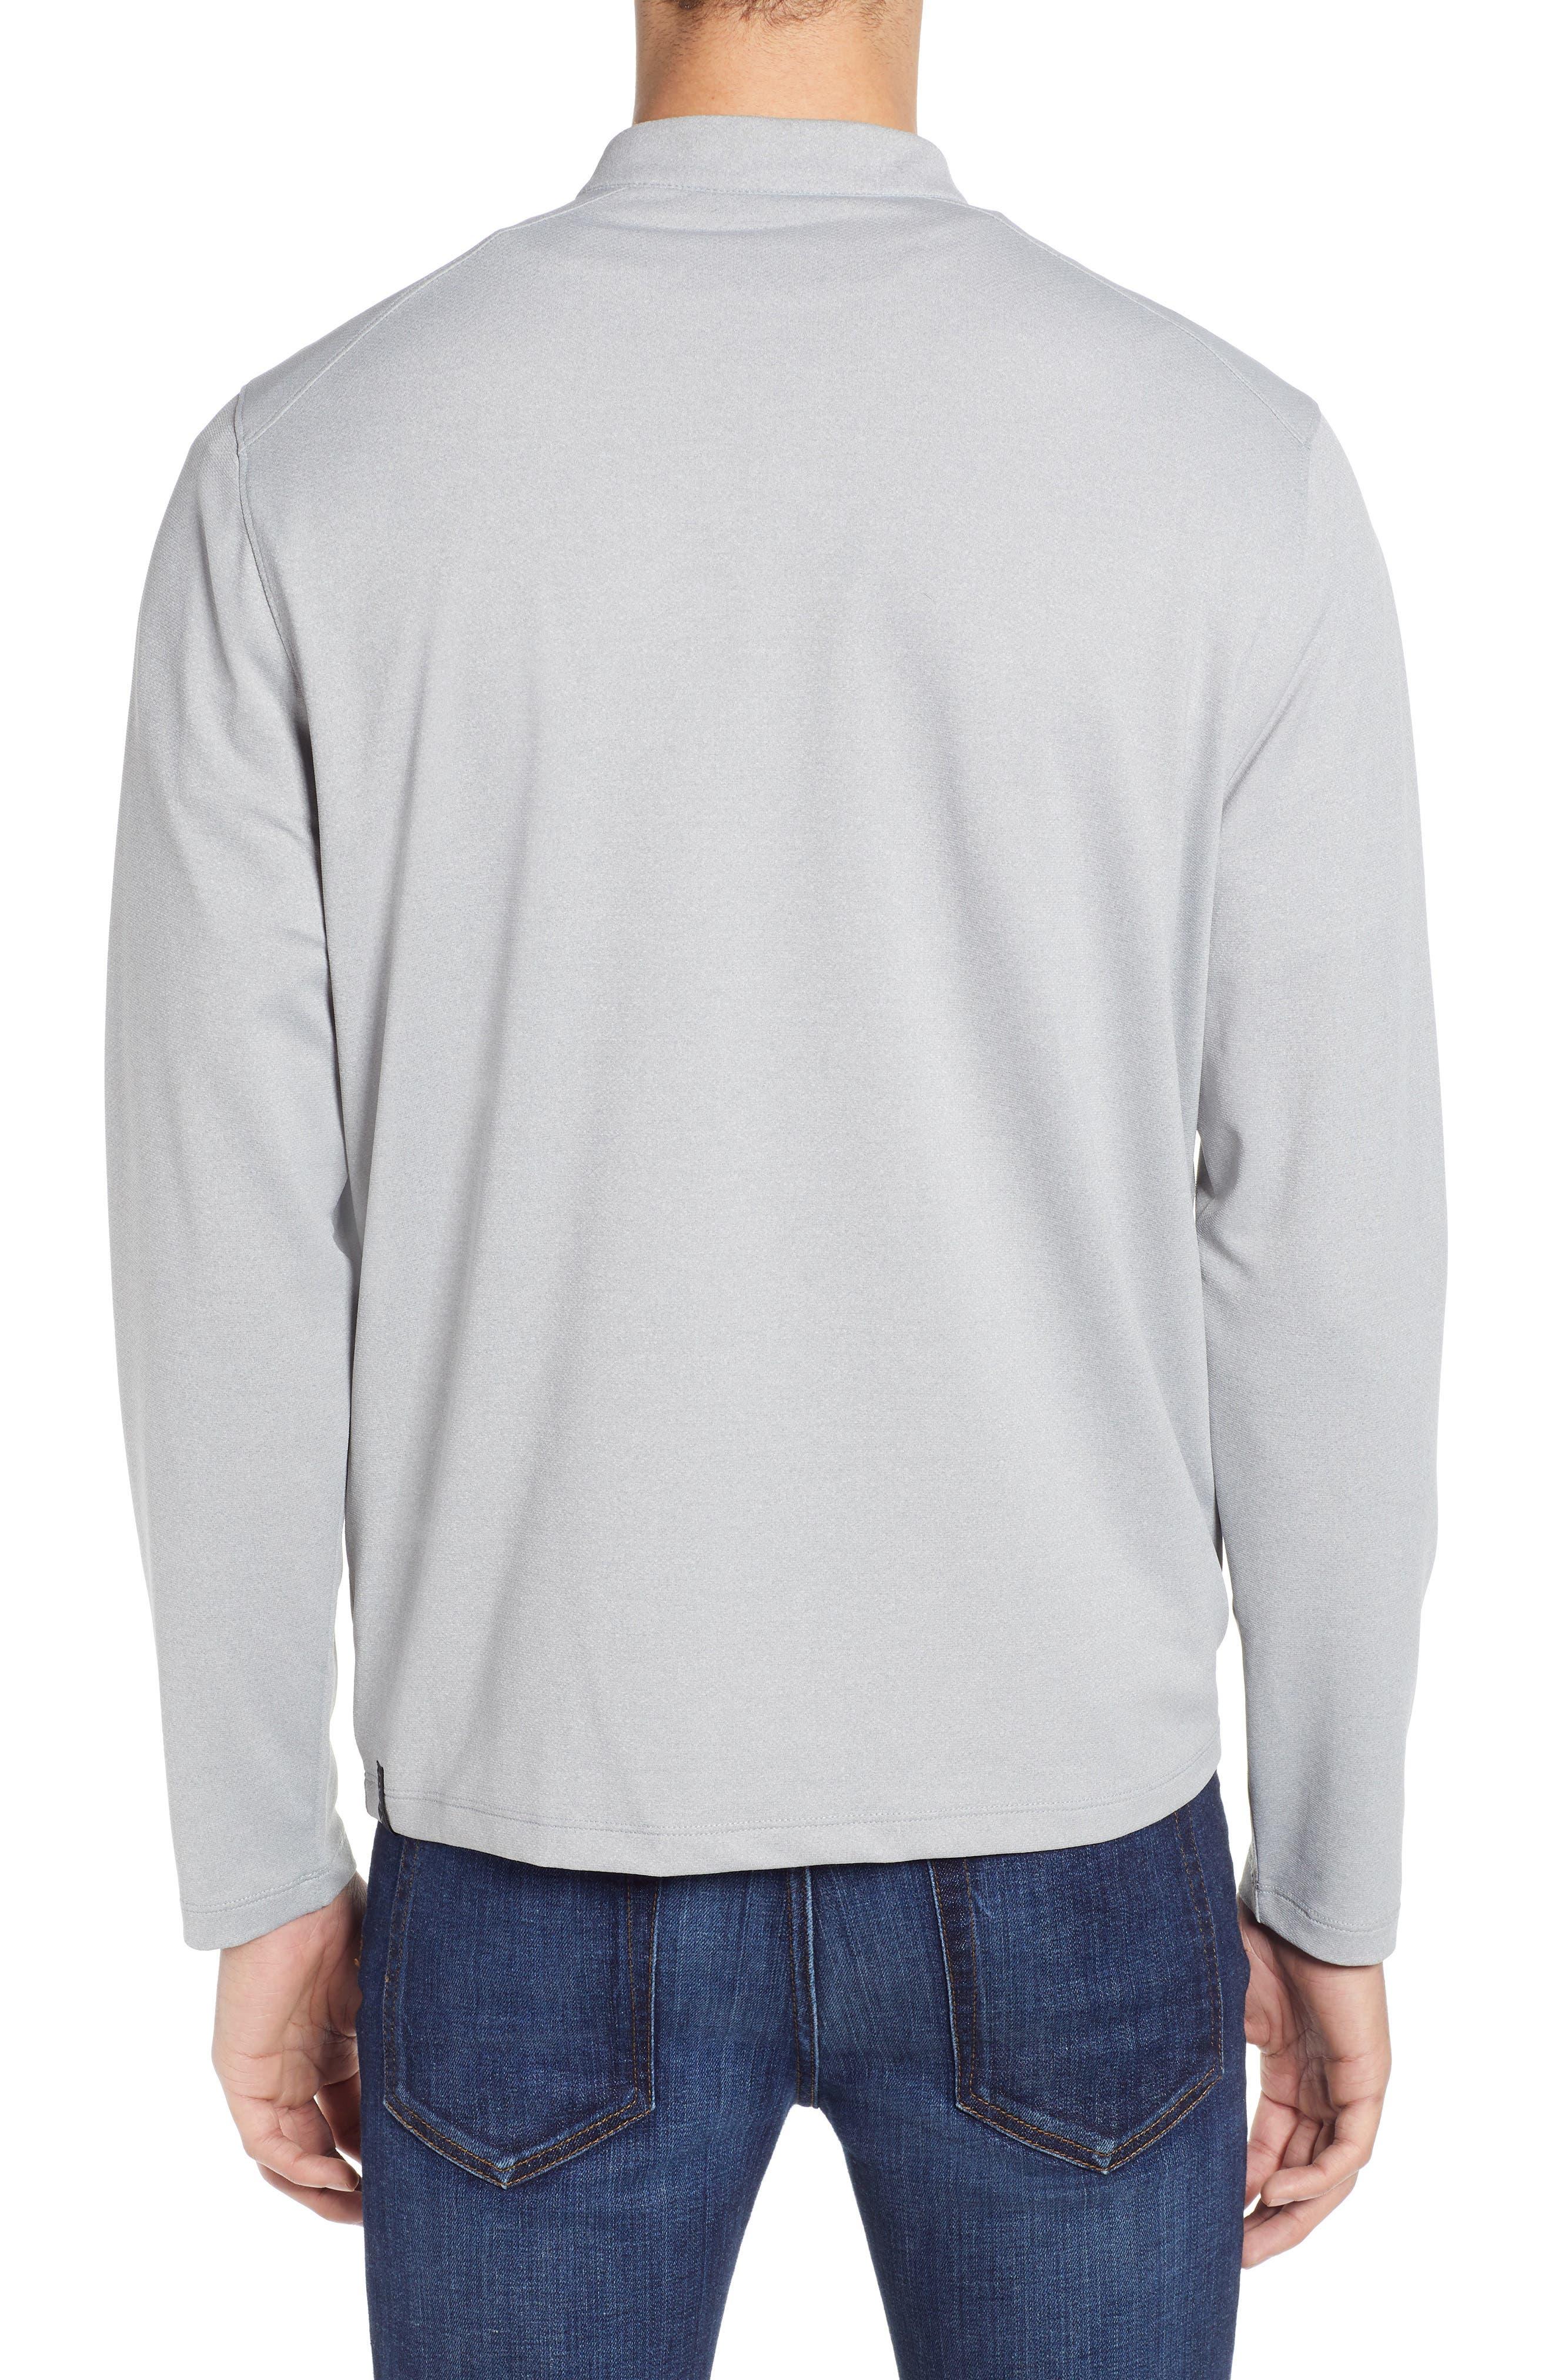 DEVEREUX, Lay-Low Half Zip Pullover, Alternate thumbnail 2, color, ASPHALT